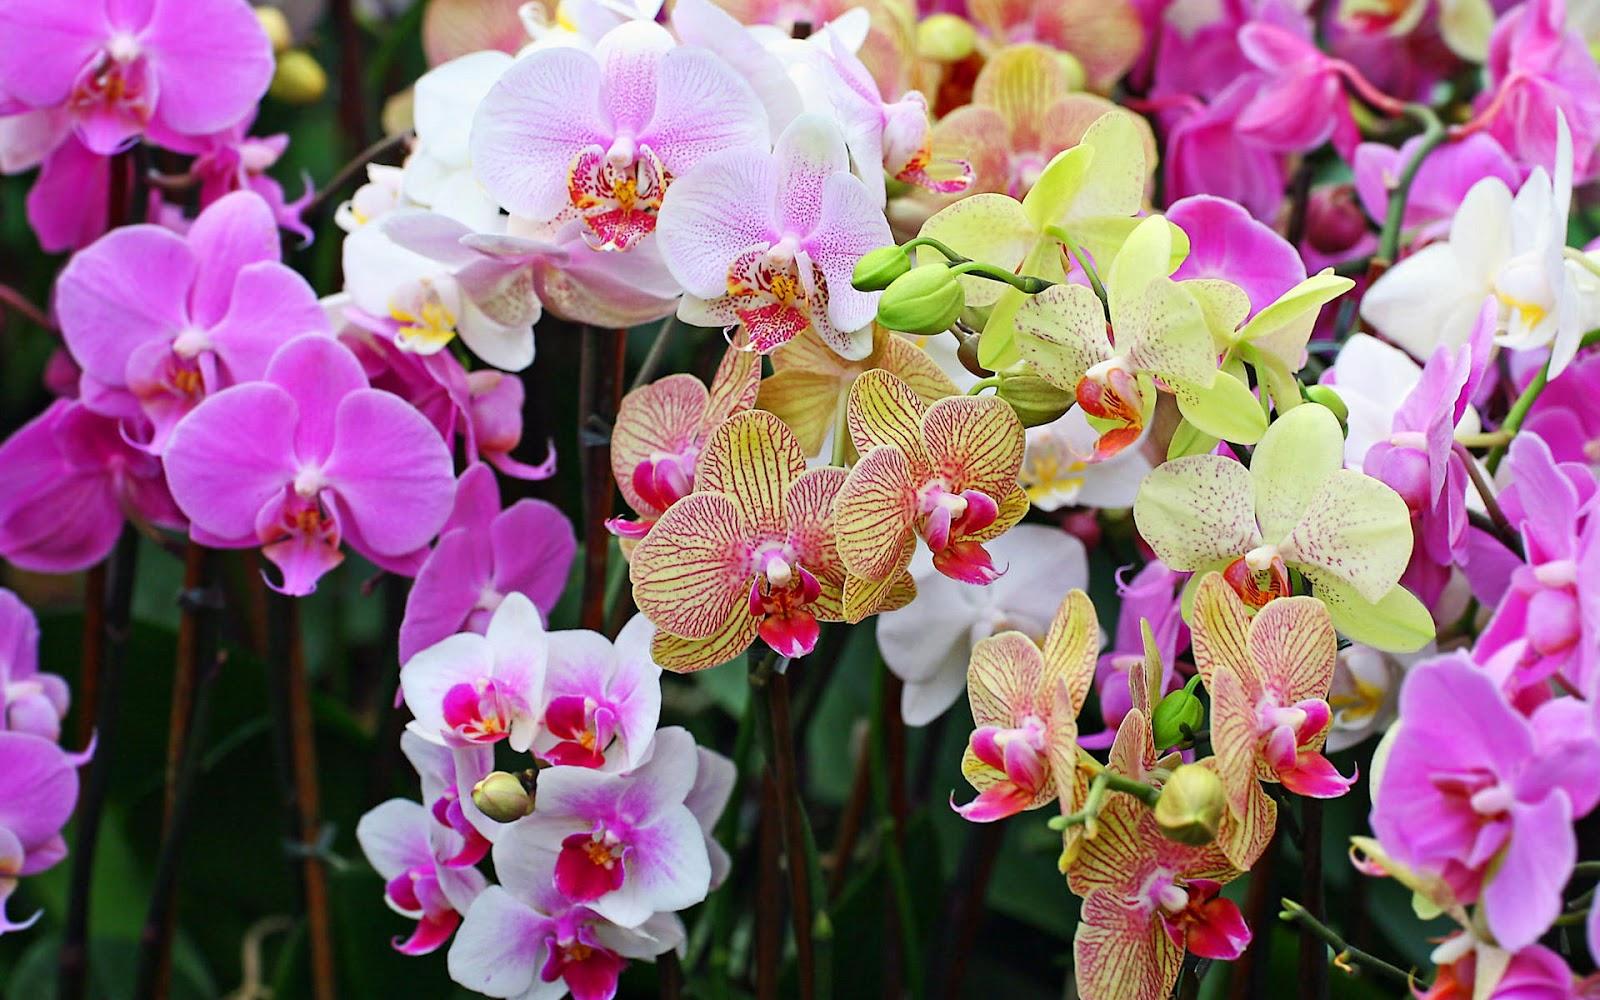 http://2.bp.blogspot.com/-64Z_JpNQ6sQ/T14nPdZNfaI/AAAAAAAAAVU/LABOZDZeAxo/s1600/Wonderful+Flowers+HD+Wallpapers+%2832%29.jpg